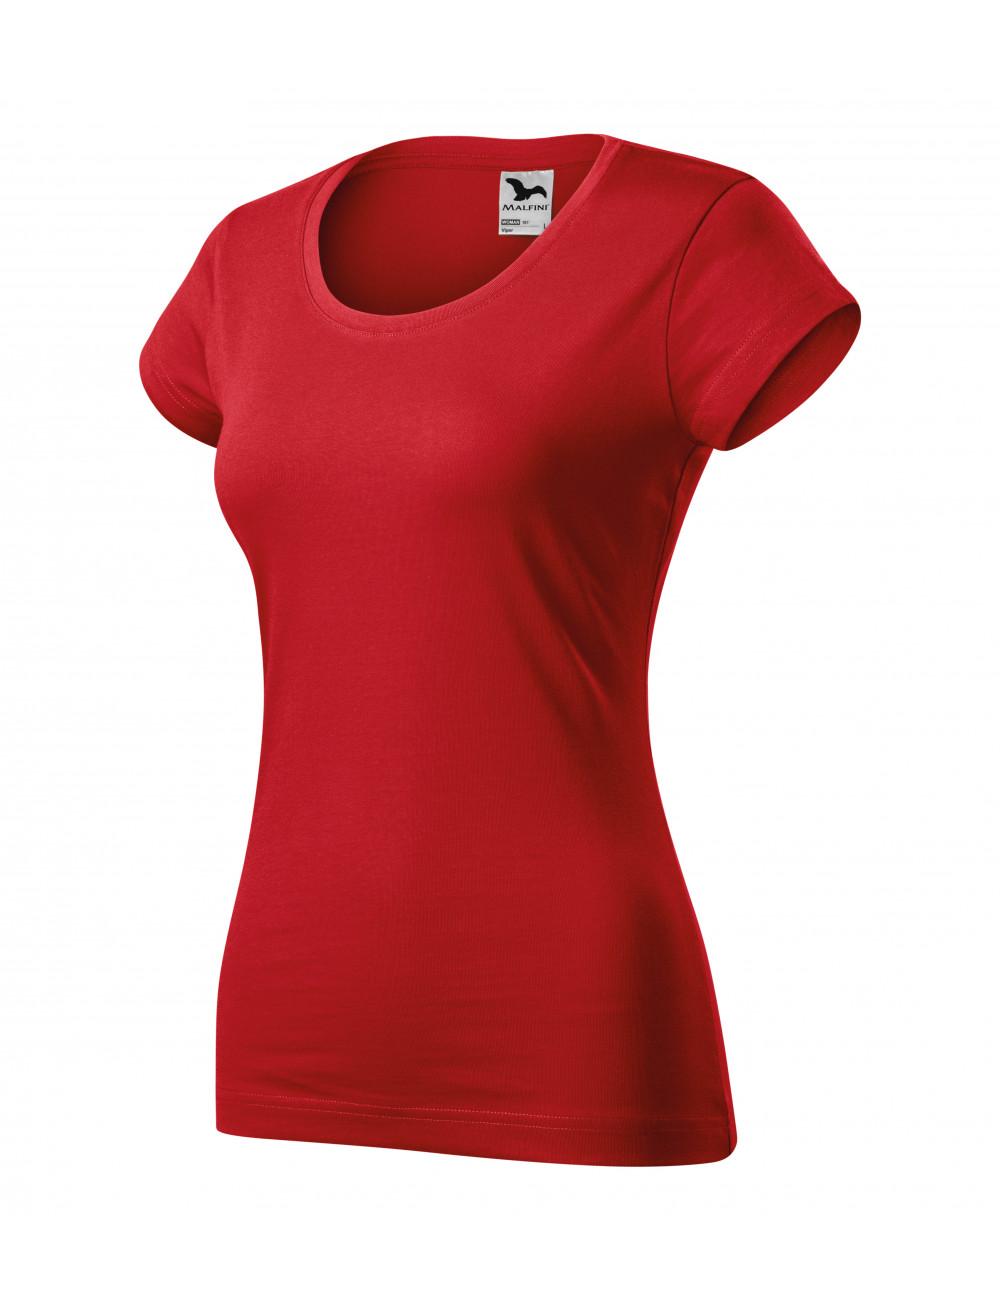 Adler MALFINI Koszulka damska Viper 161 czerwony